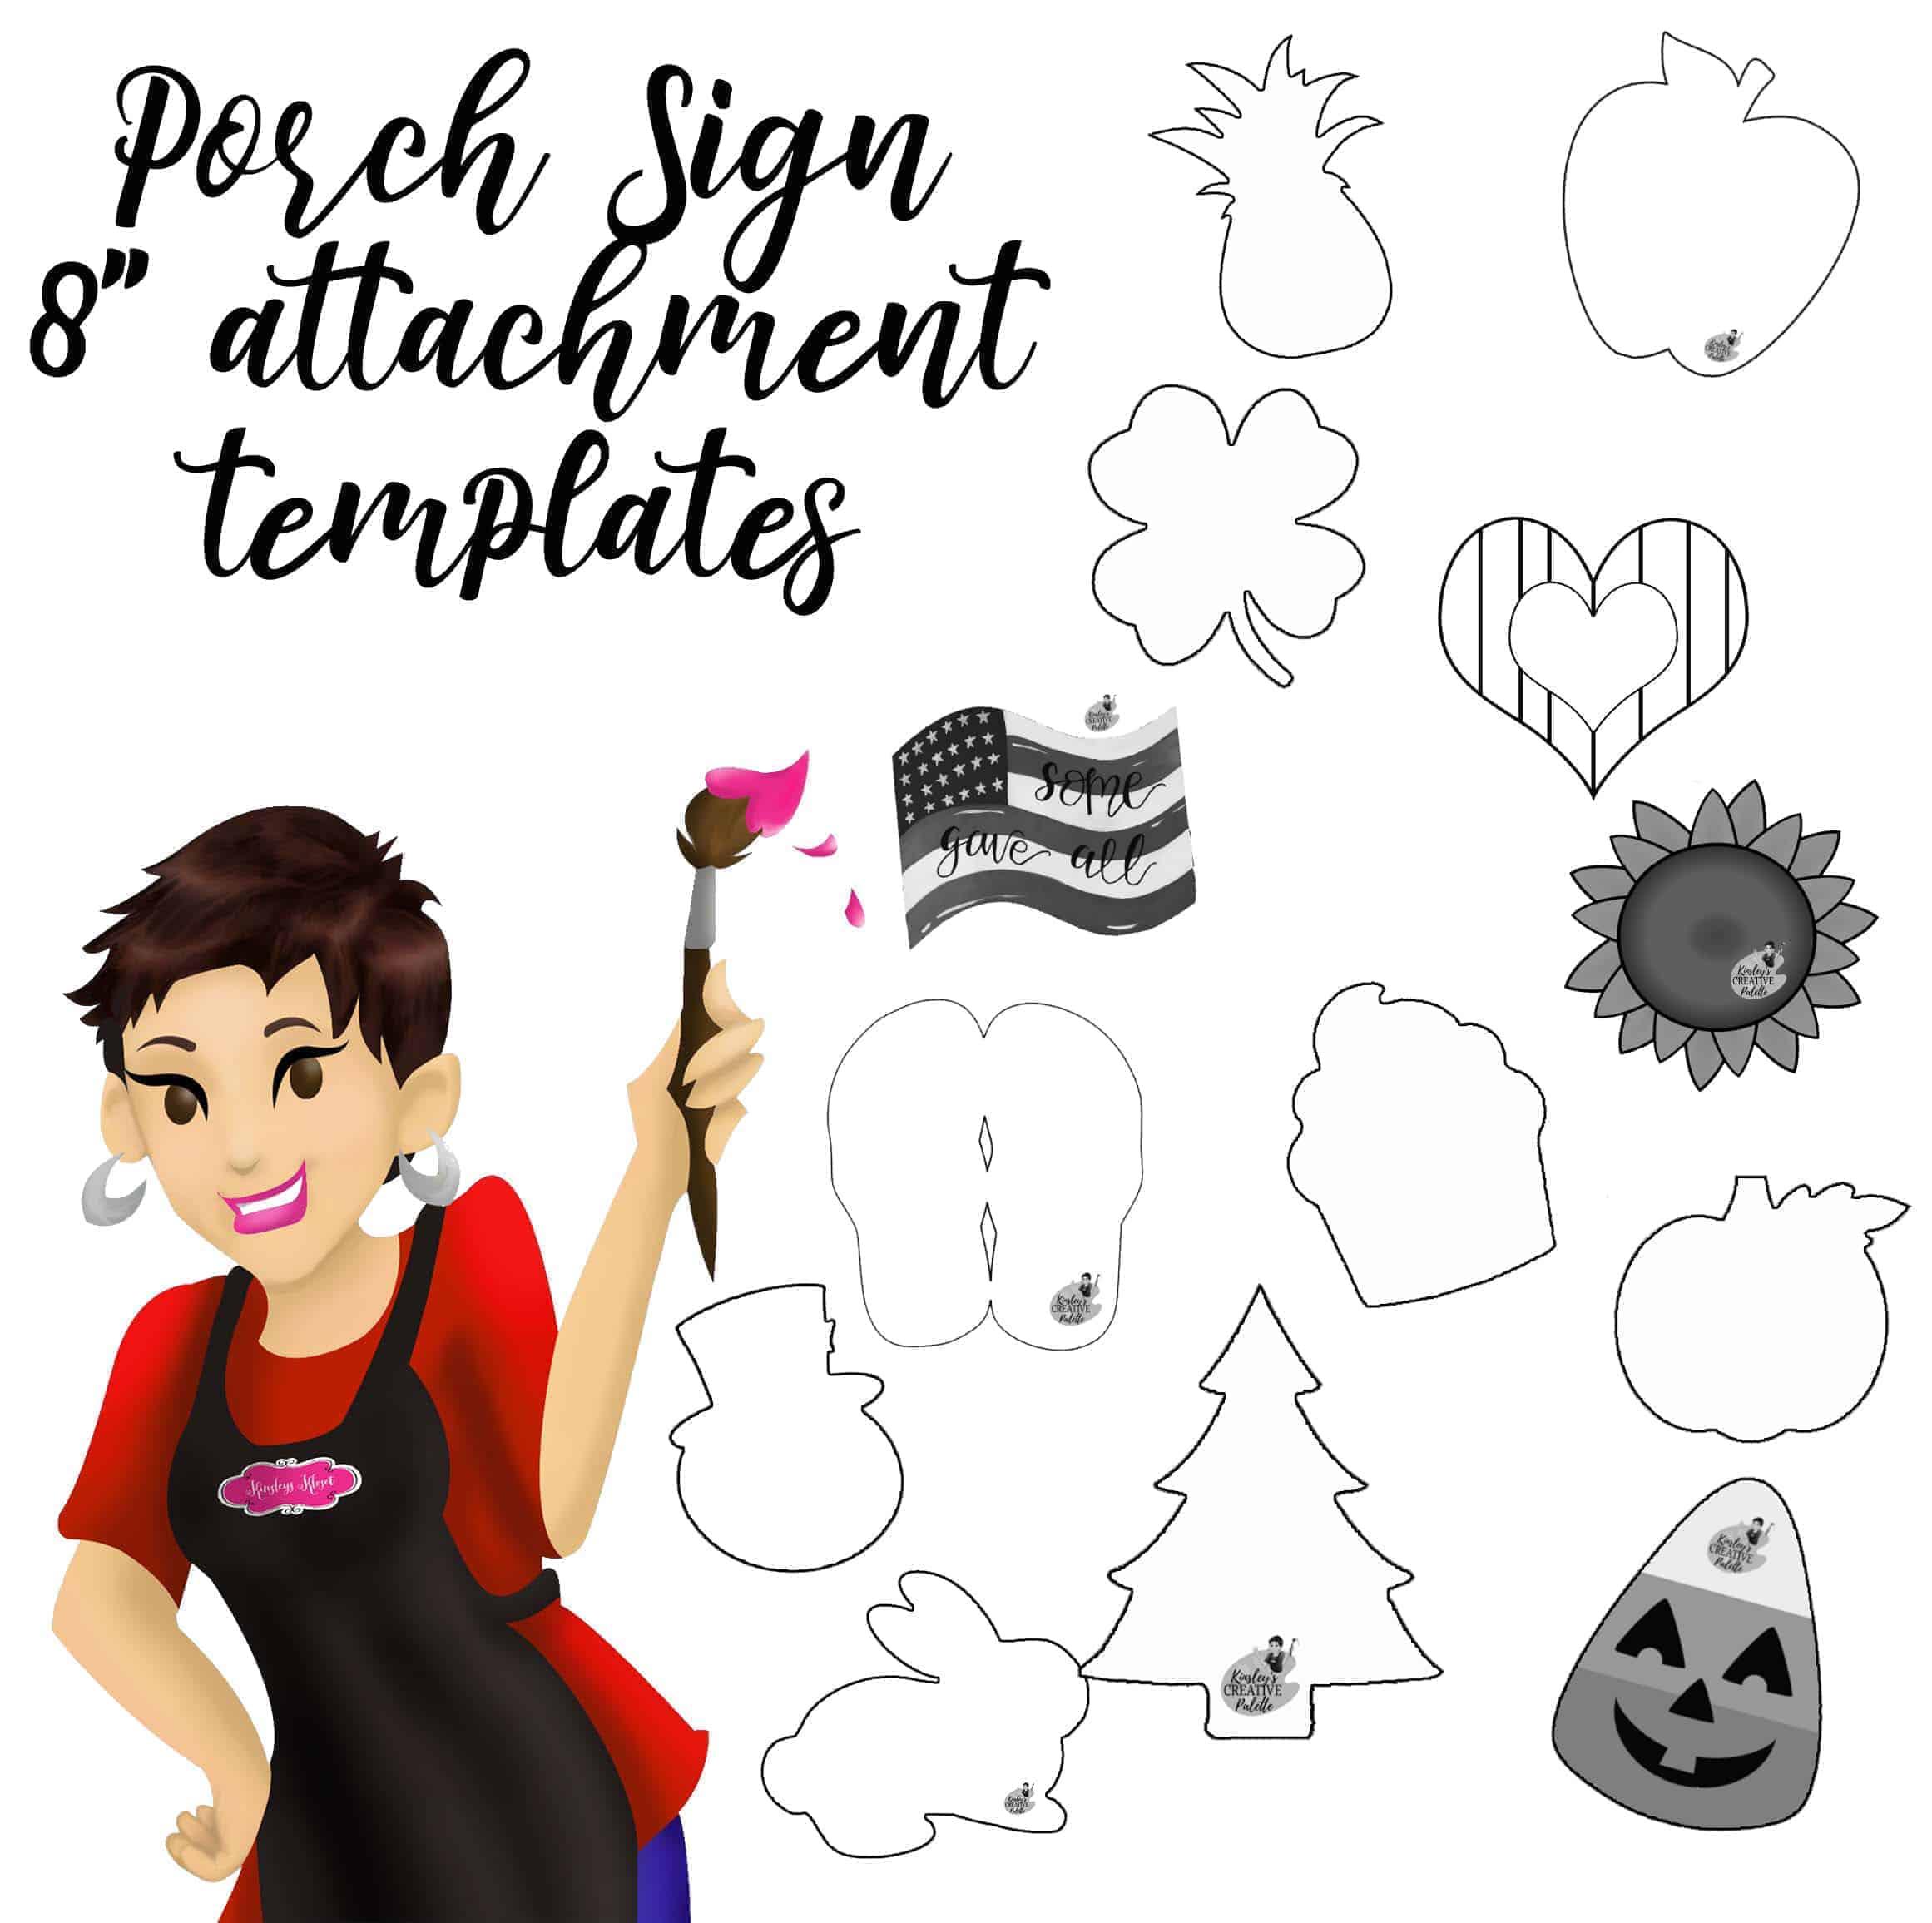 porch sign attachment template set 8 inch